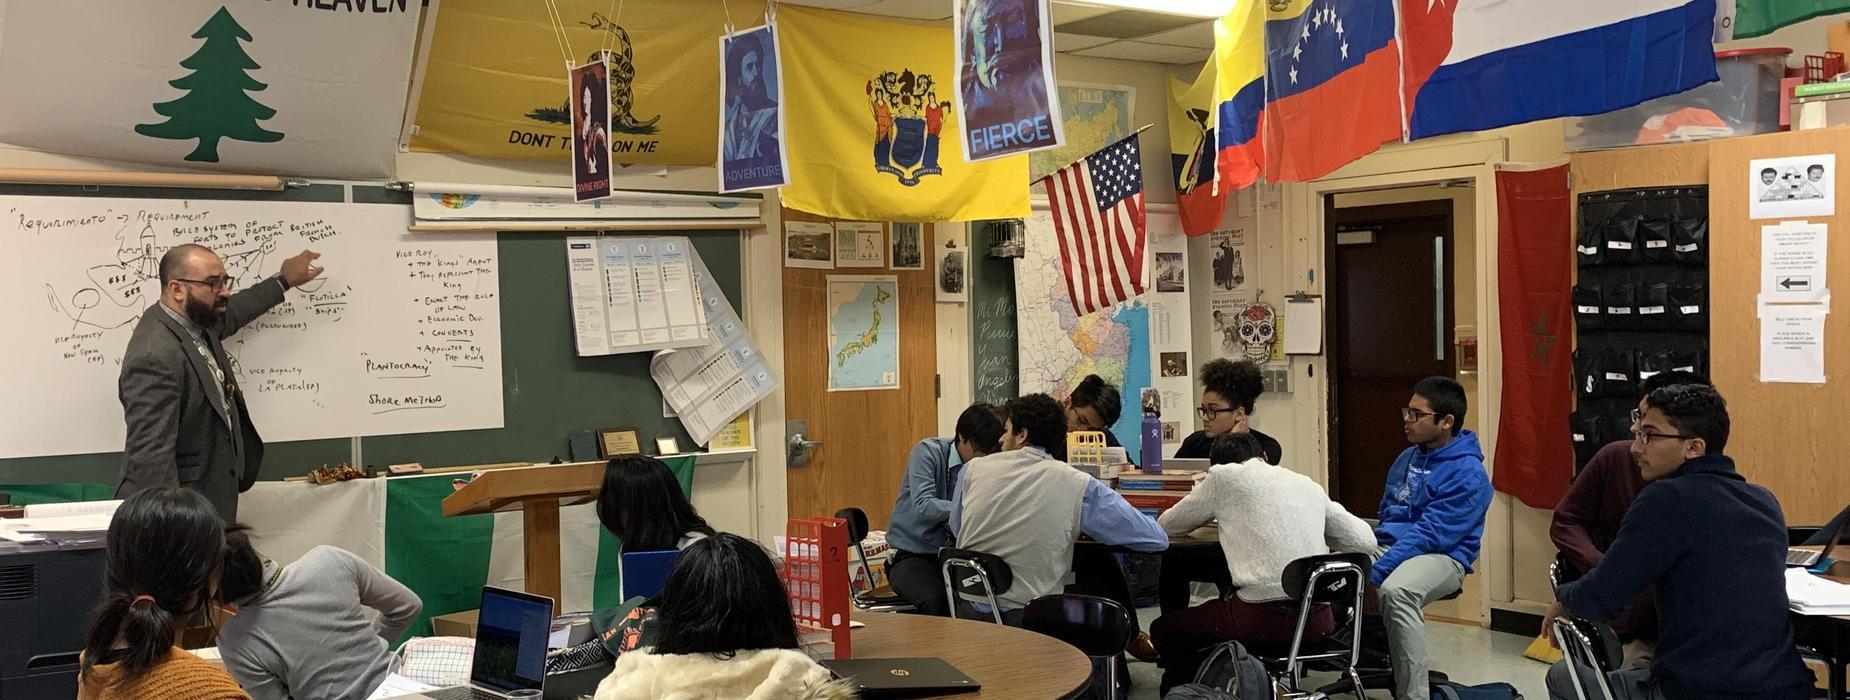 Mr. Maldonado engaging his students.